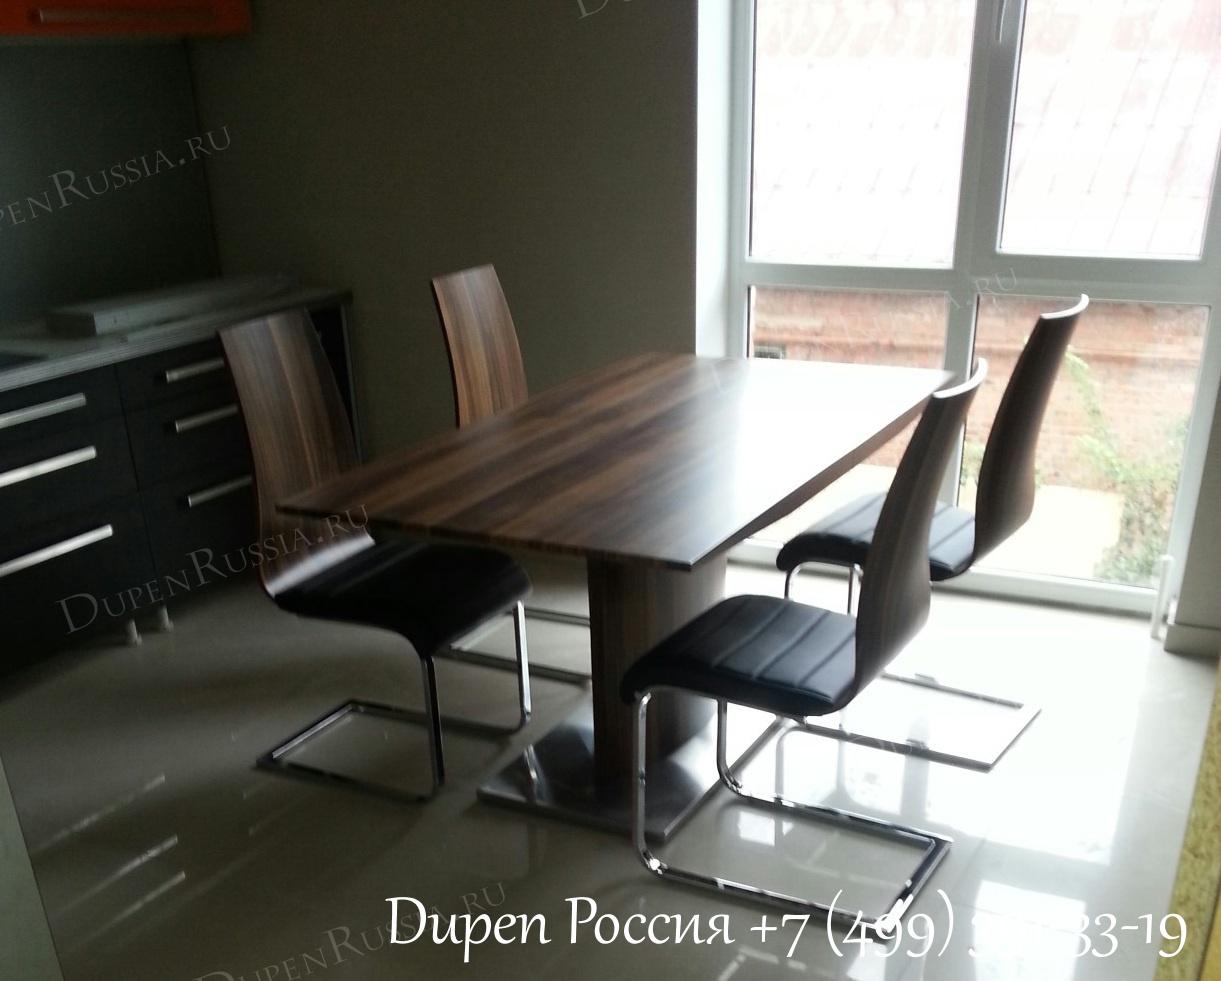 Обеденный стол DUPEN (Дюпен) DT-02 орех и Стулья DUPEN (Дюпен) CH-1004